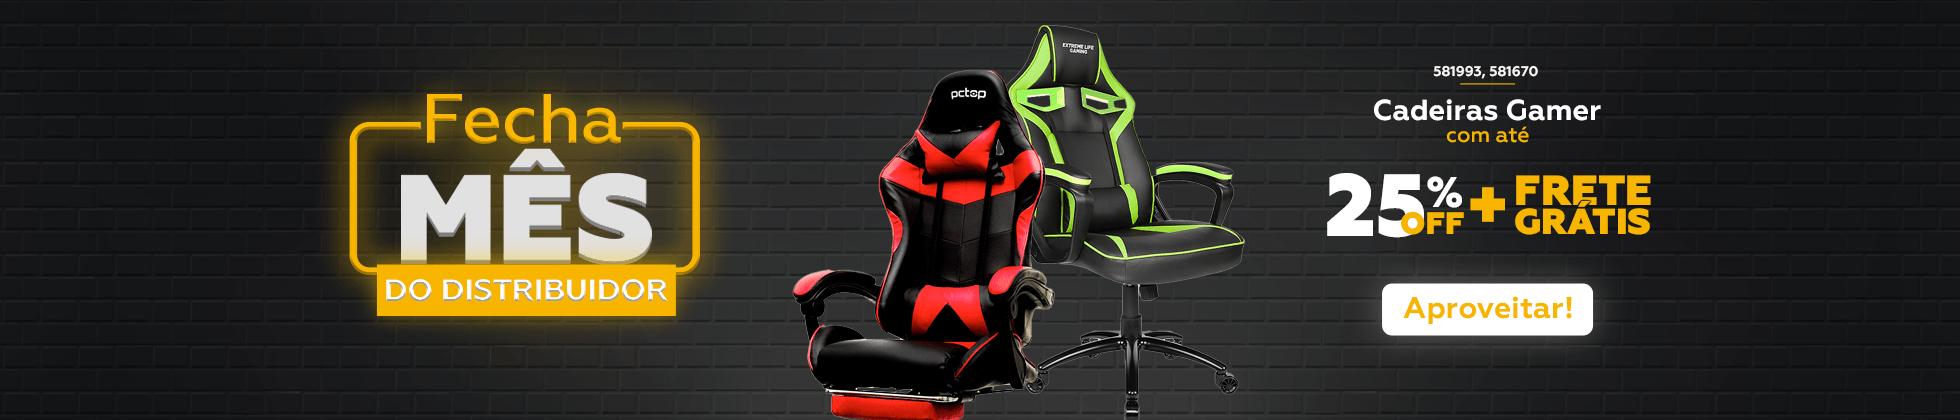 Cadeiras Gamer